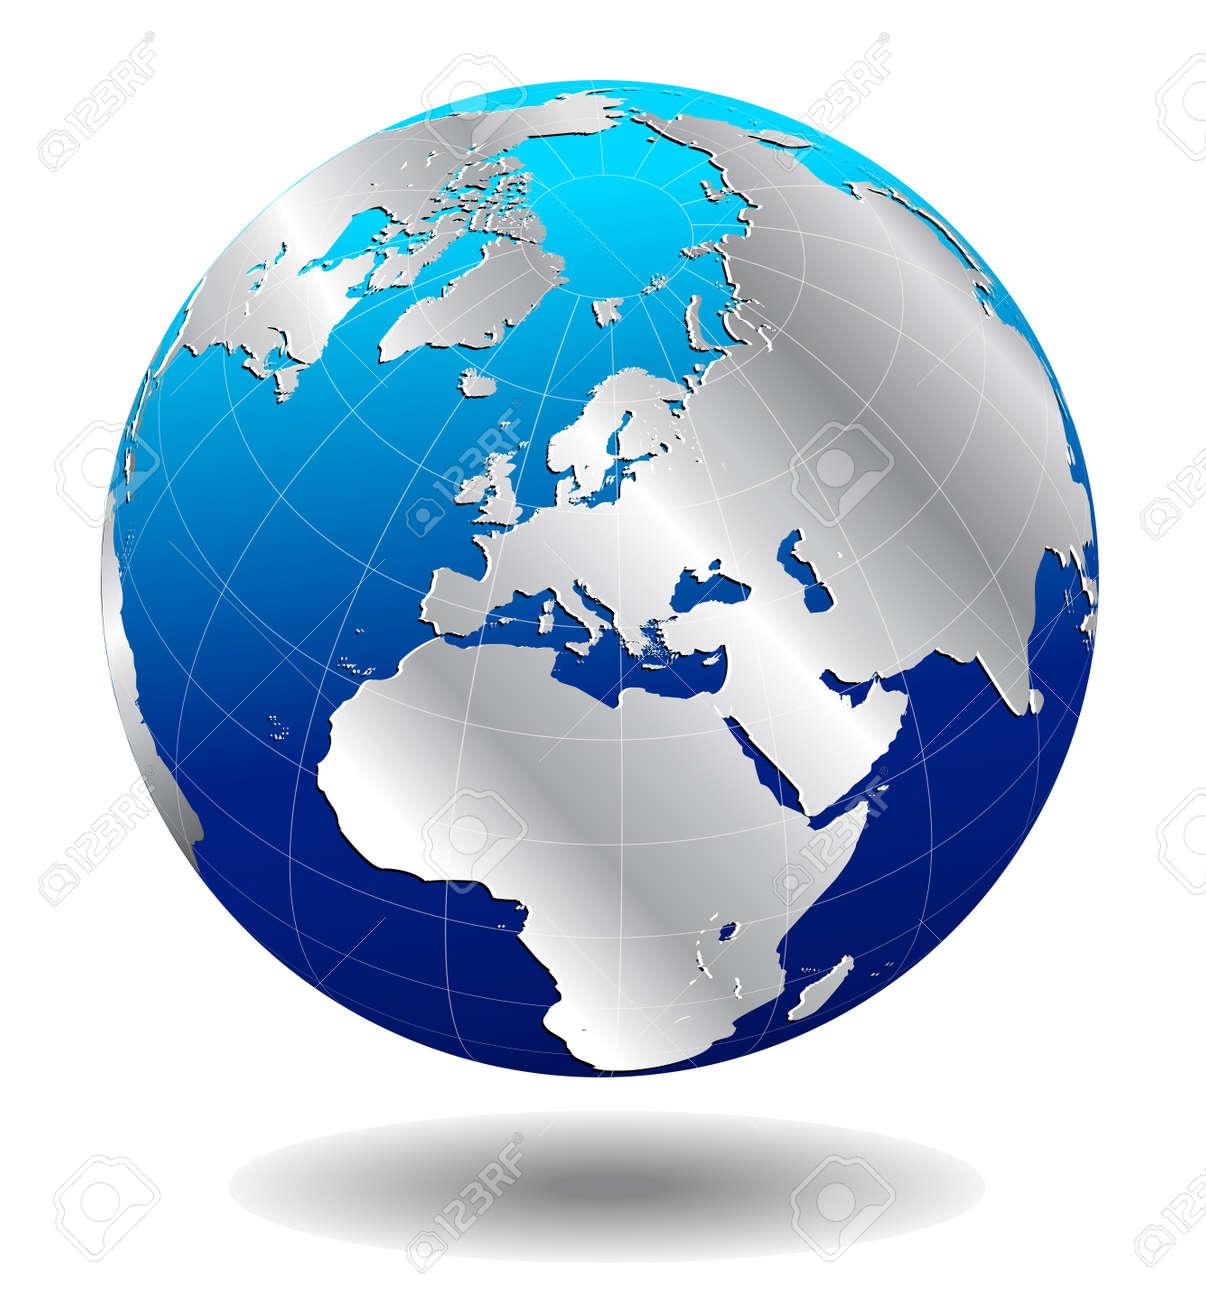 Europe Silver Global World - 27566346